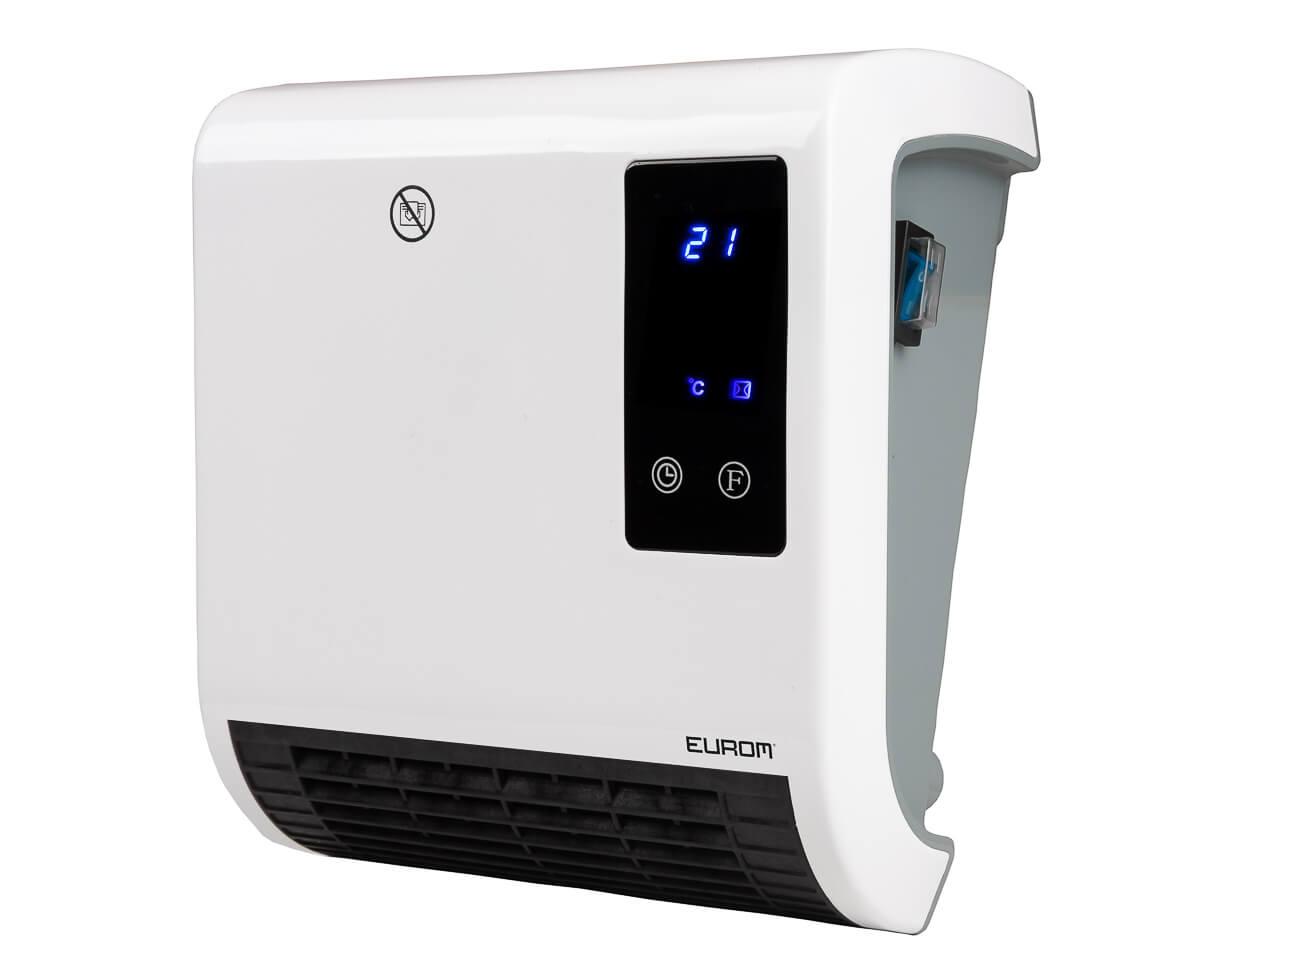 Eurom Sani-Fanheat 2000R Elektrische verwarming 2000W   Badkamerverwarming met Afstandsbediening